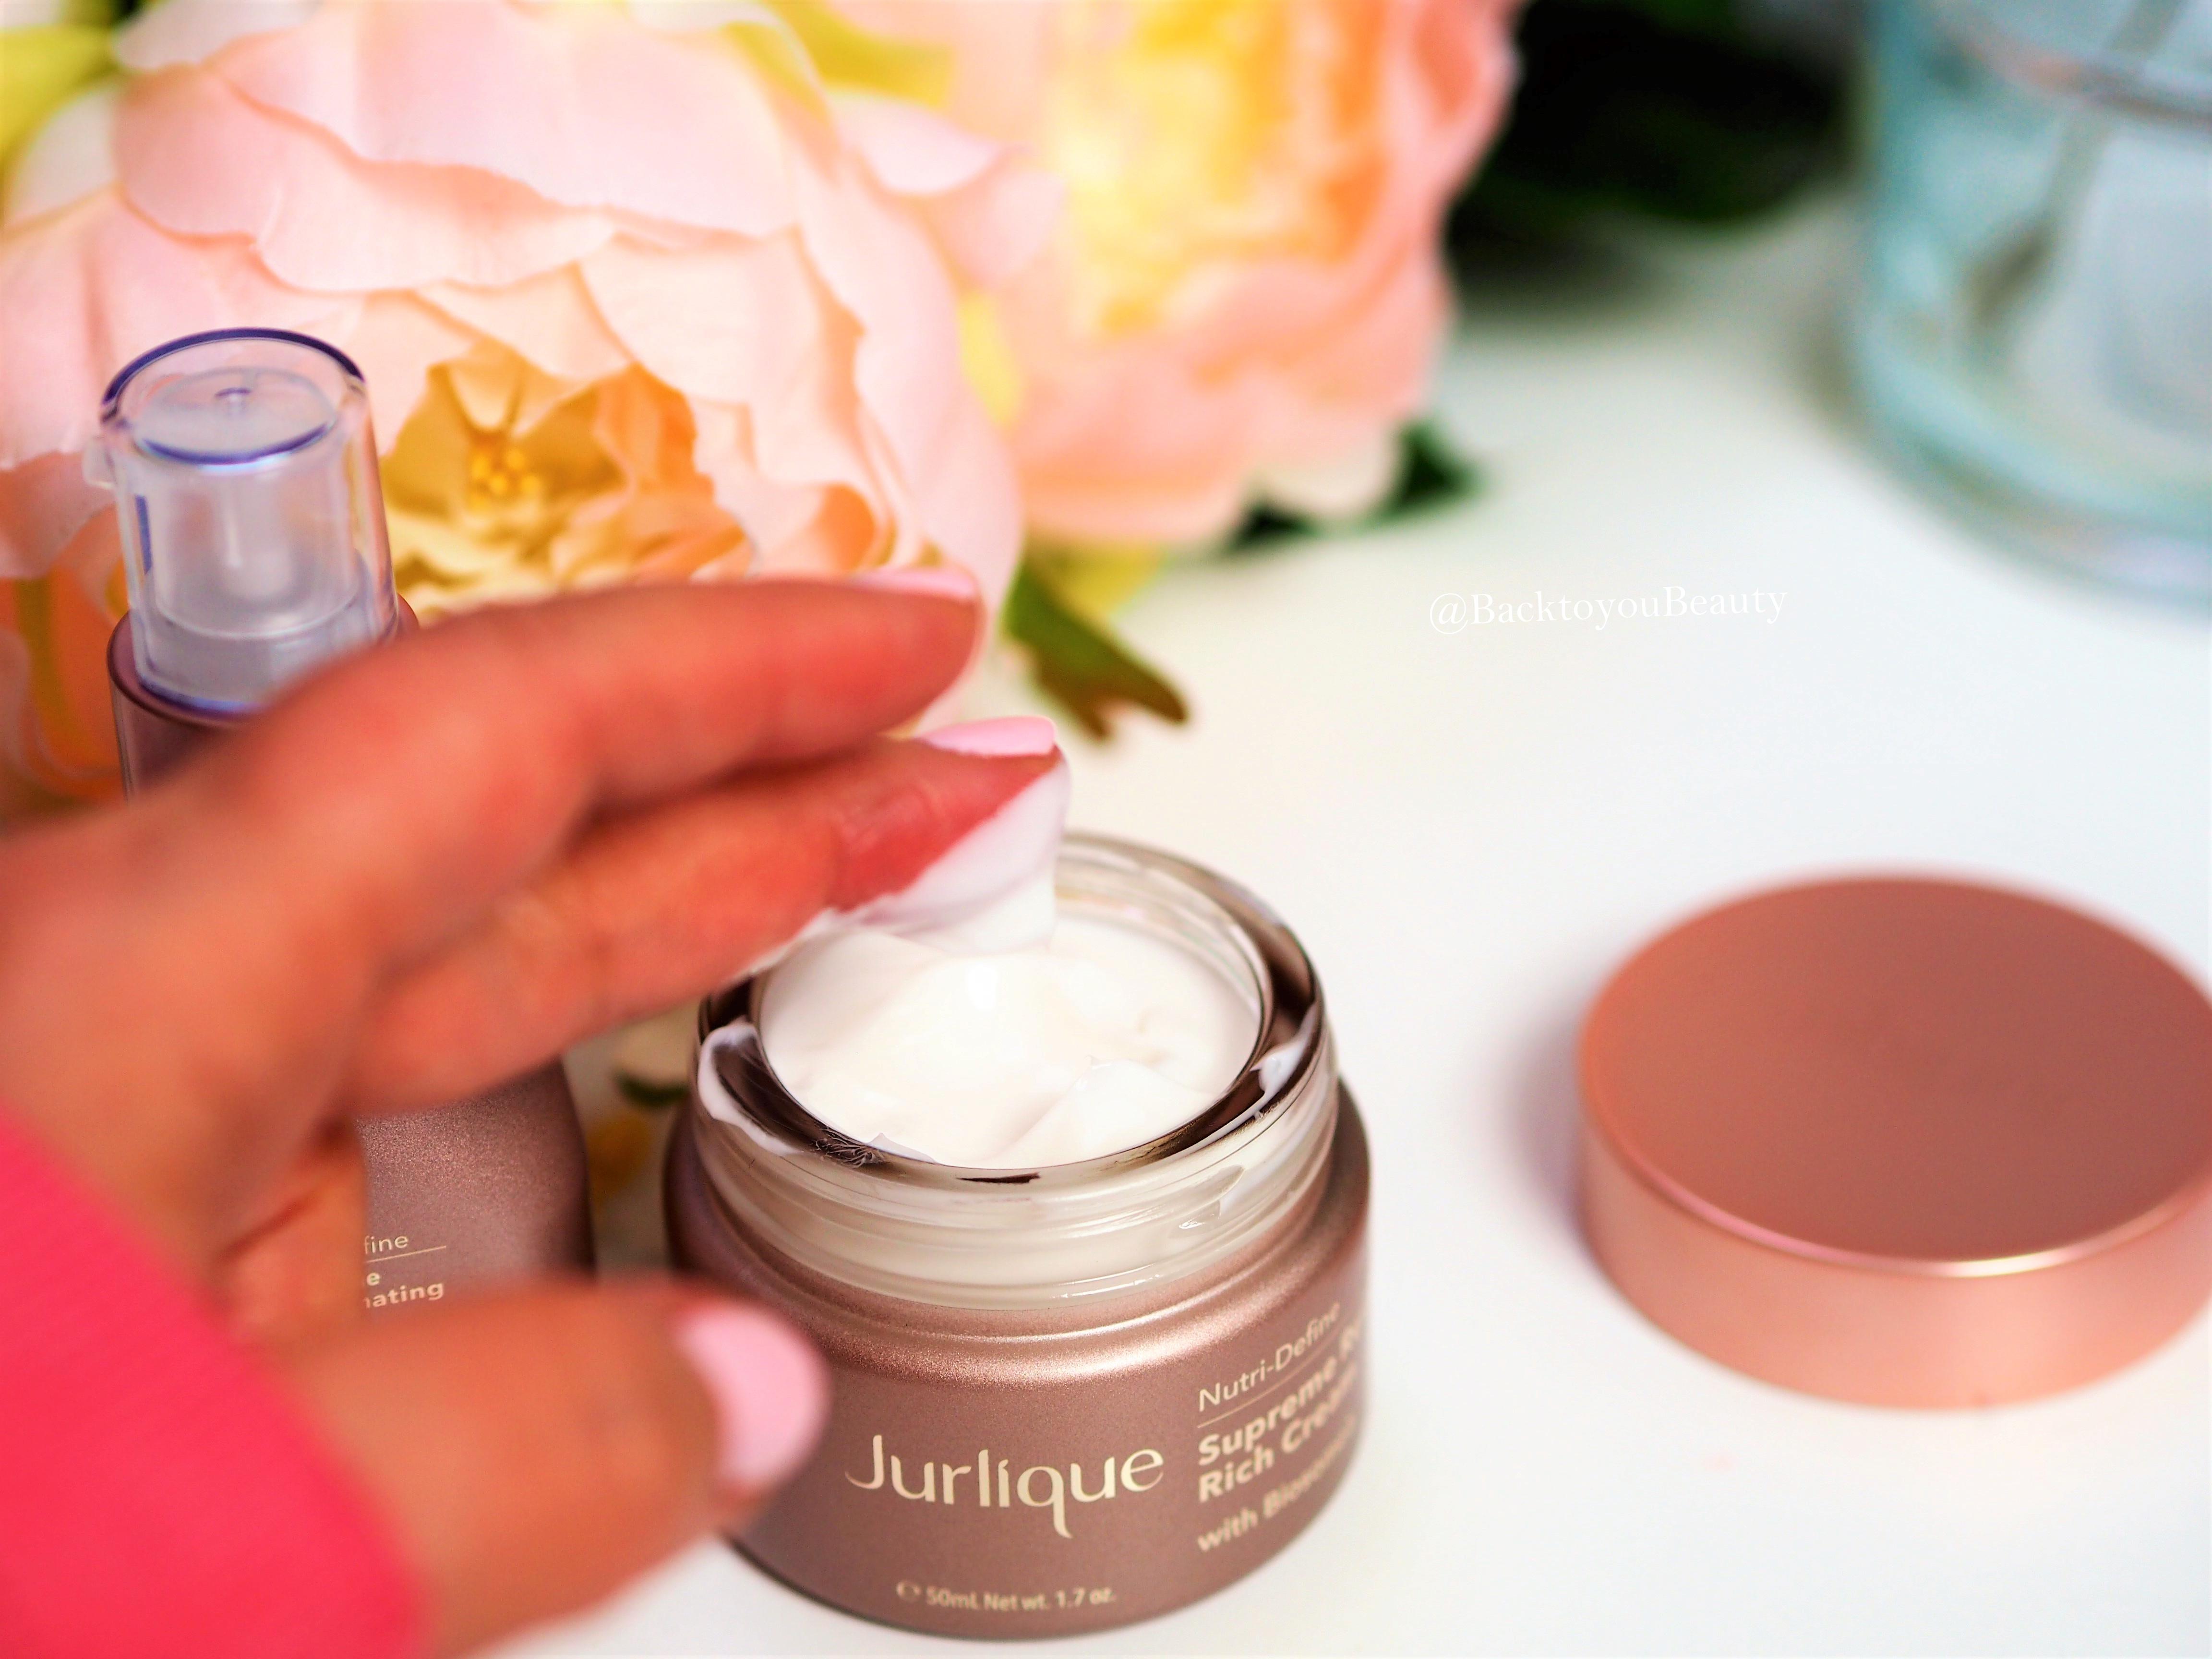 jurlique Supreme Restorative Rich Cream 50ml